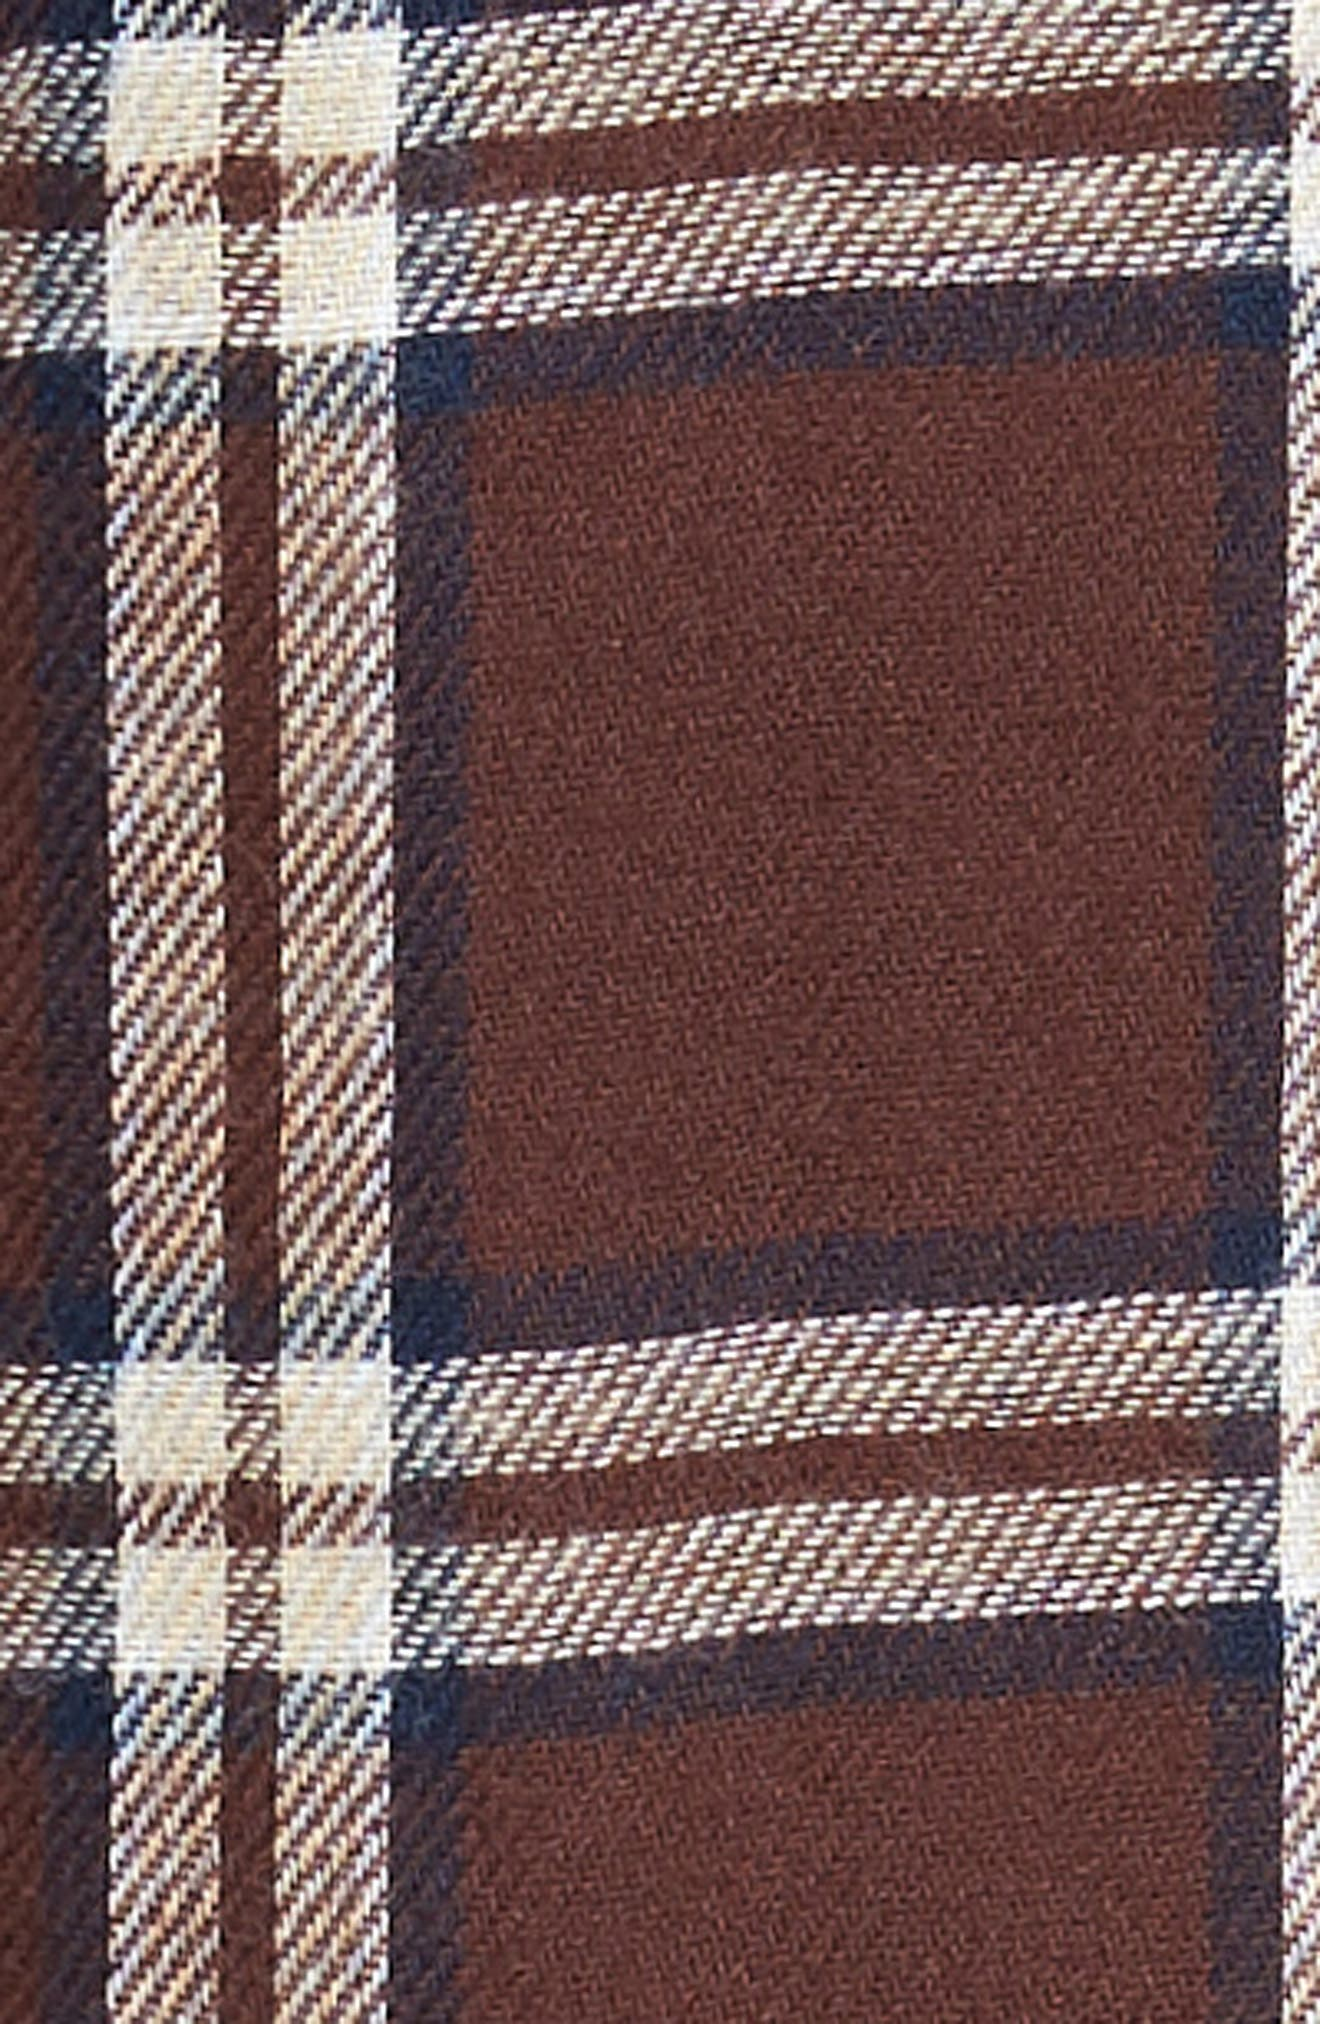 Grant Pajama Set,                             Alternate thumbnail 5, color,                             PORT/ GREY HEATHER